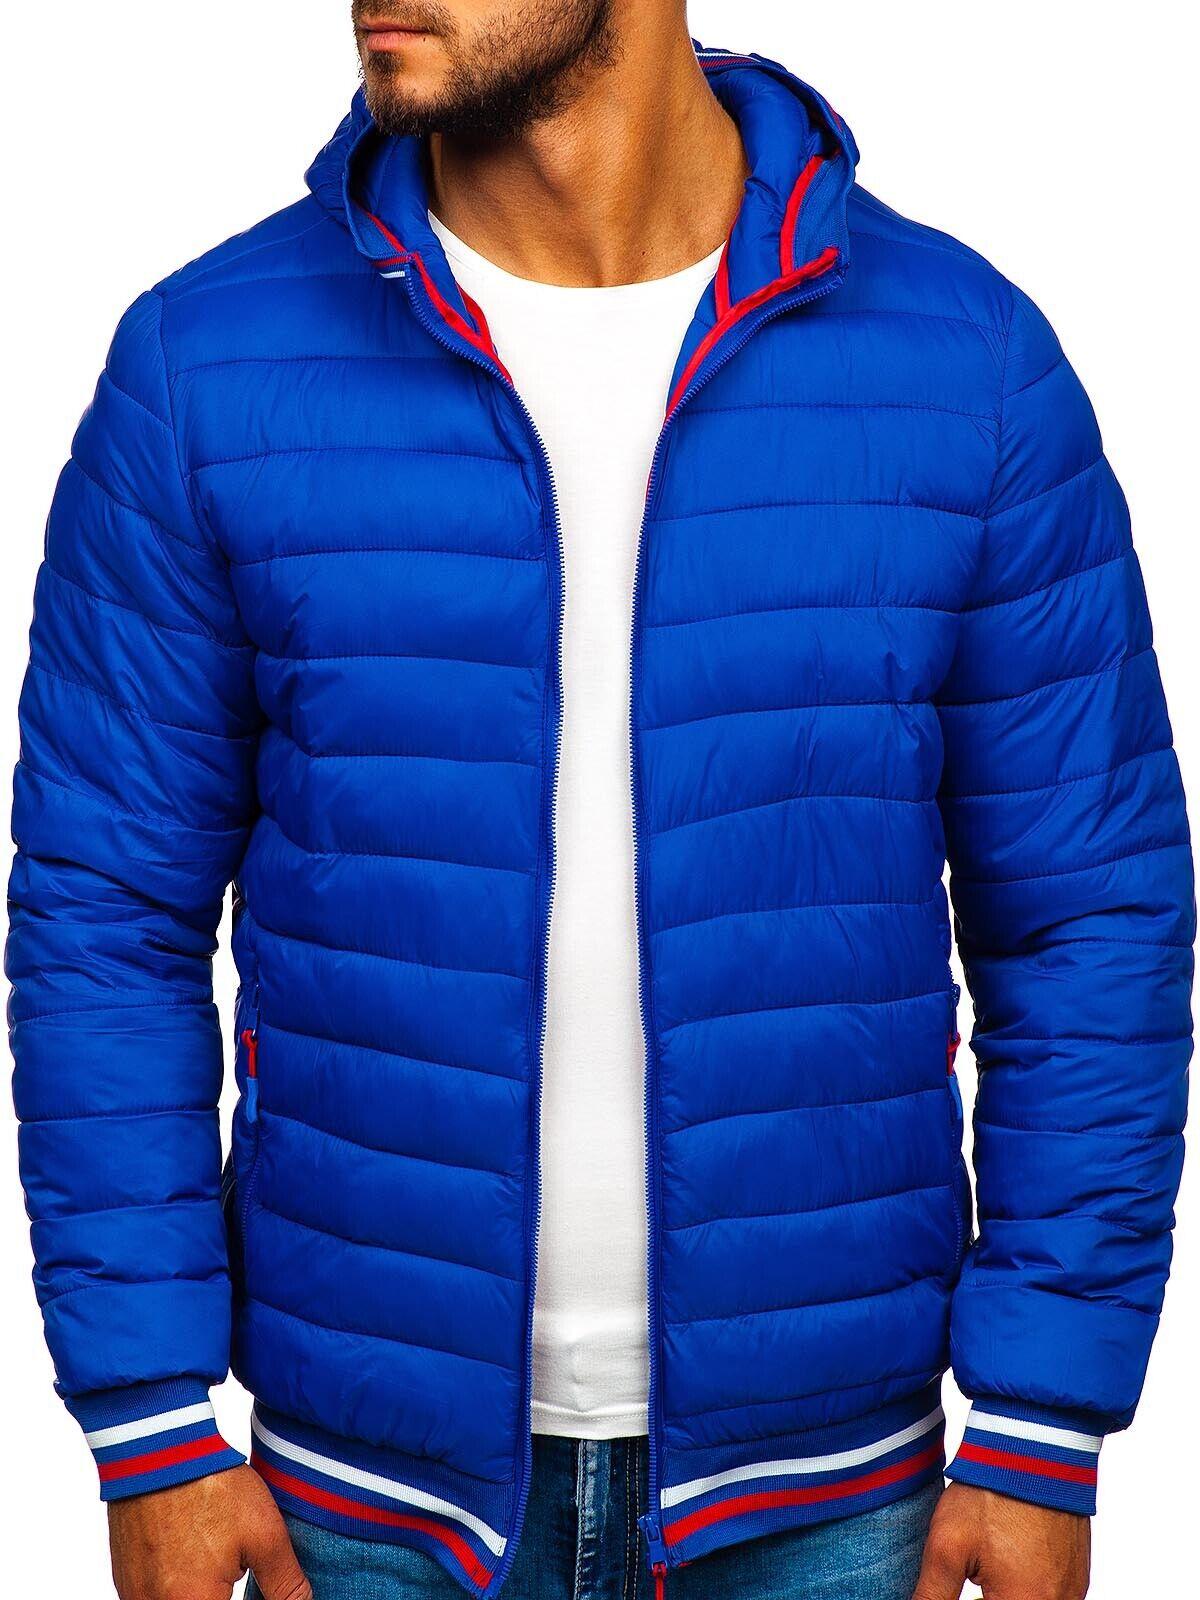 J.Style LY1009 Blau